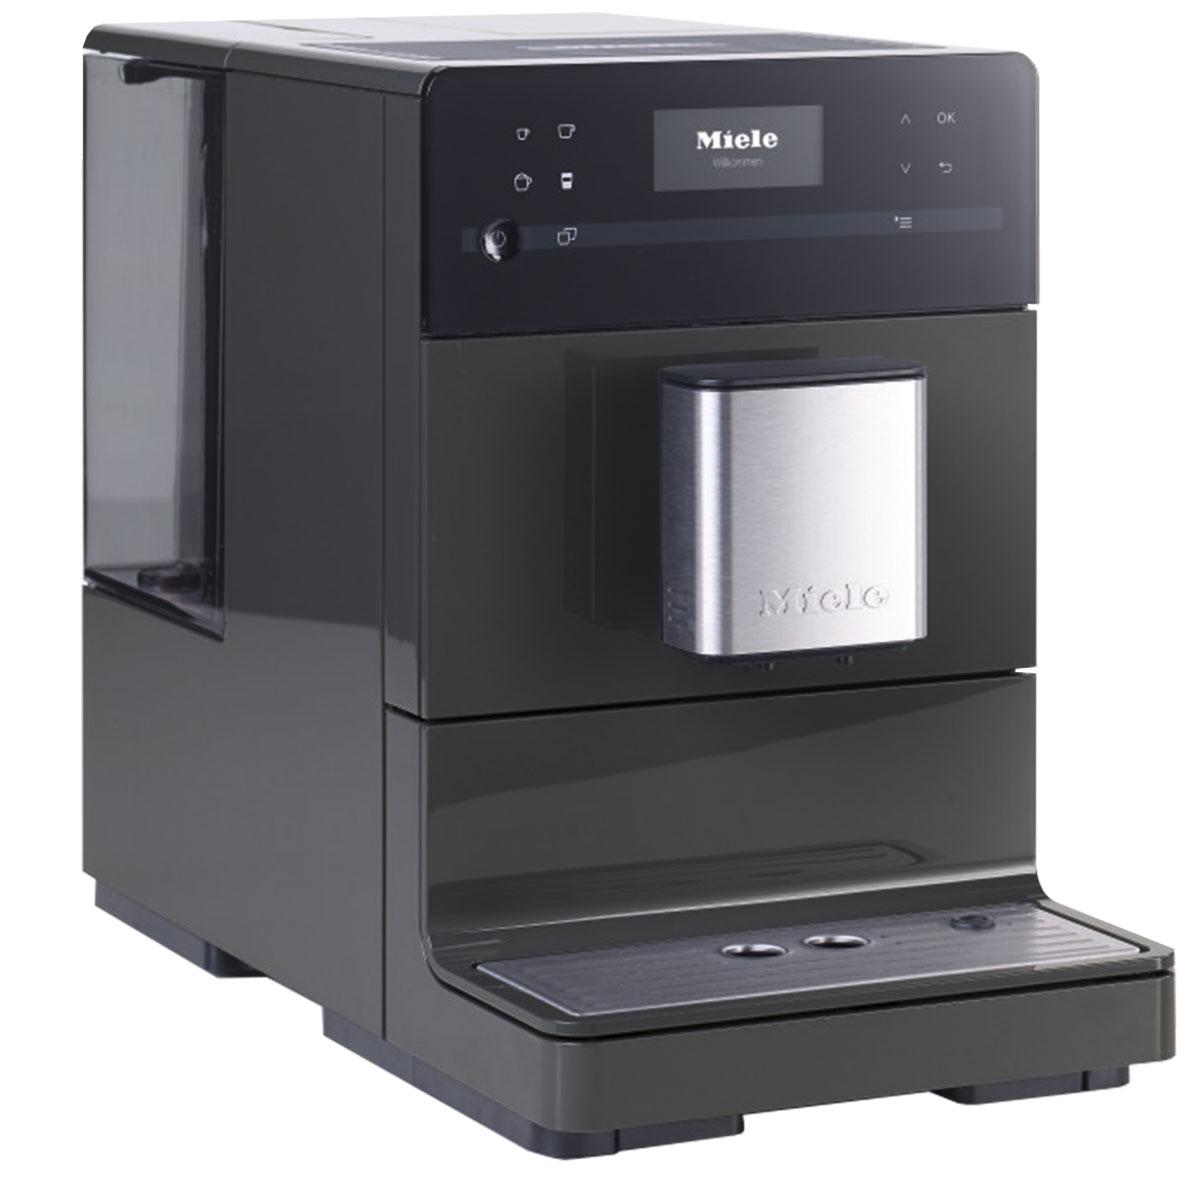 Miele espressomaskine - CM 5300 - Graphite grey